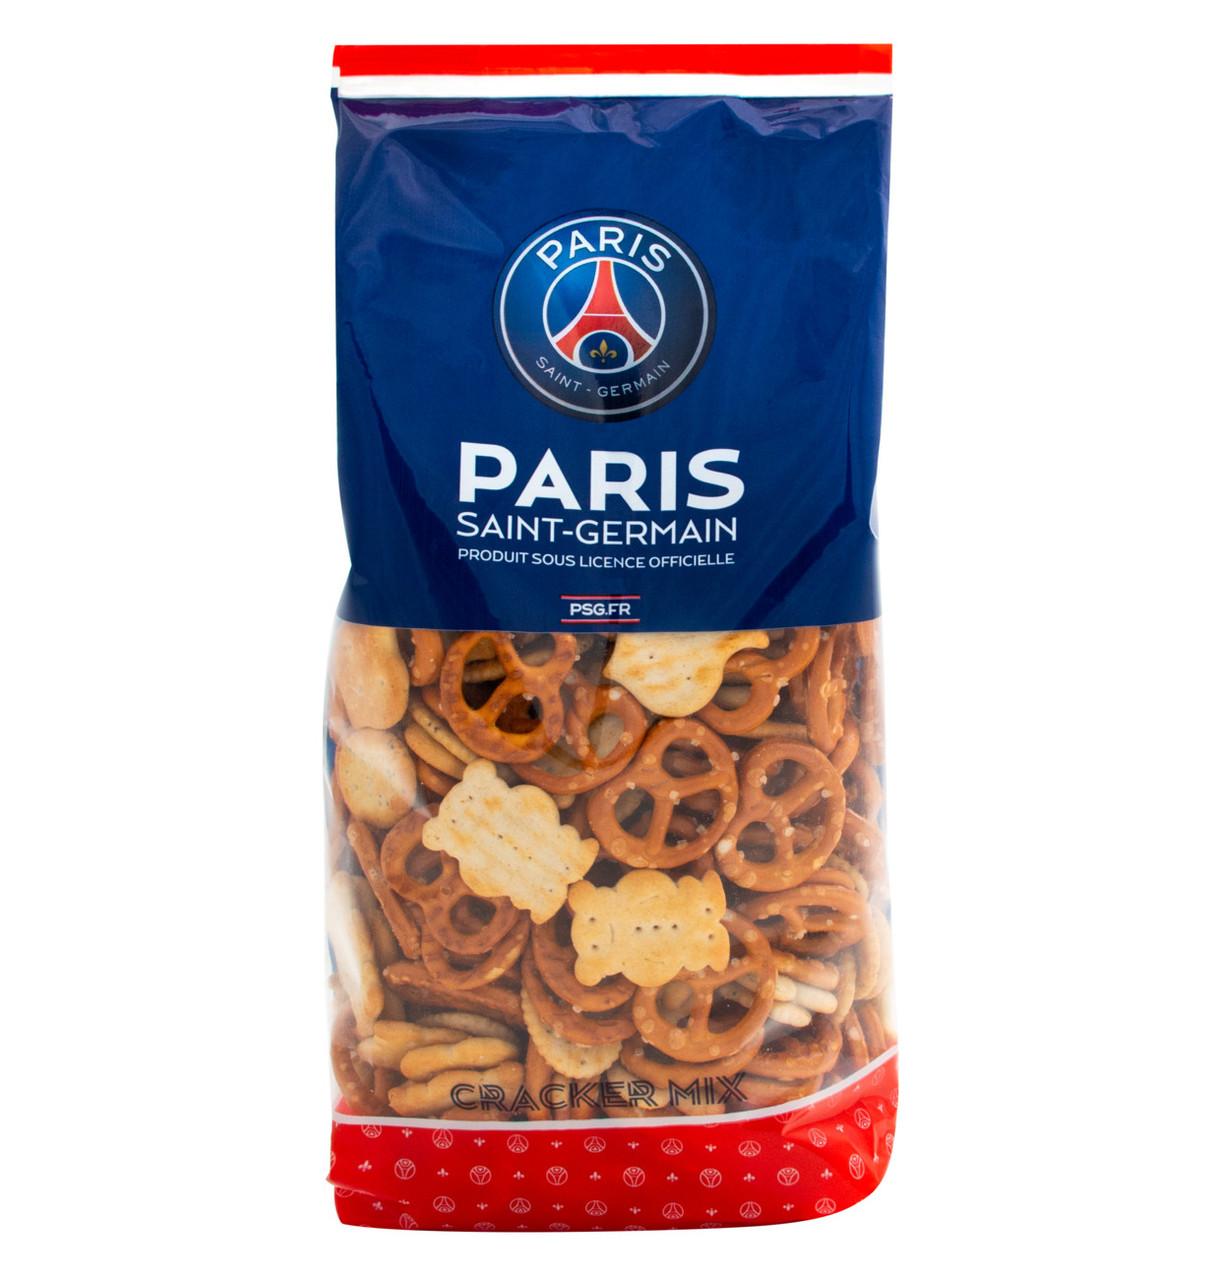 Хрустики PSG Snack mixture, 300г, 30шт/ящ